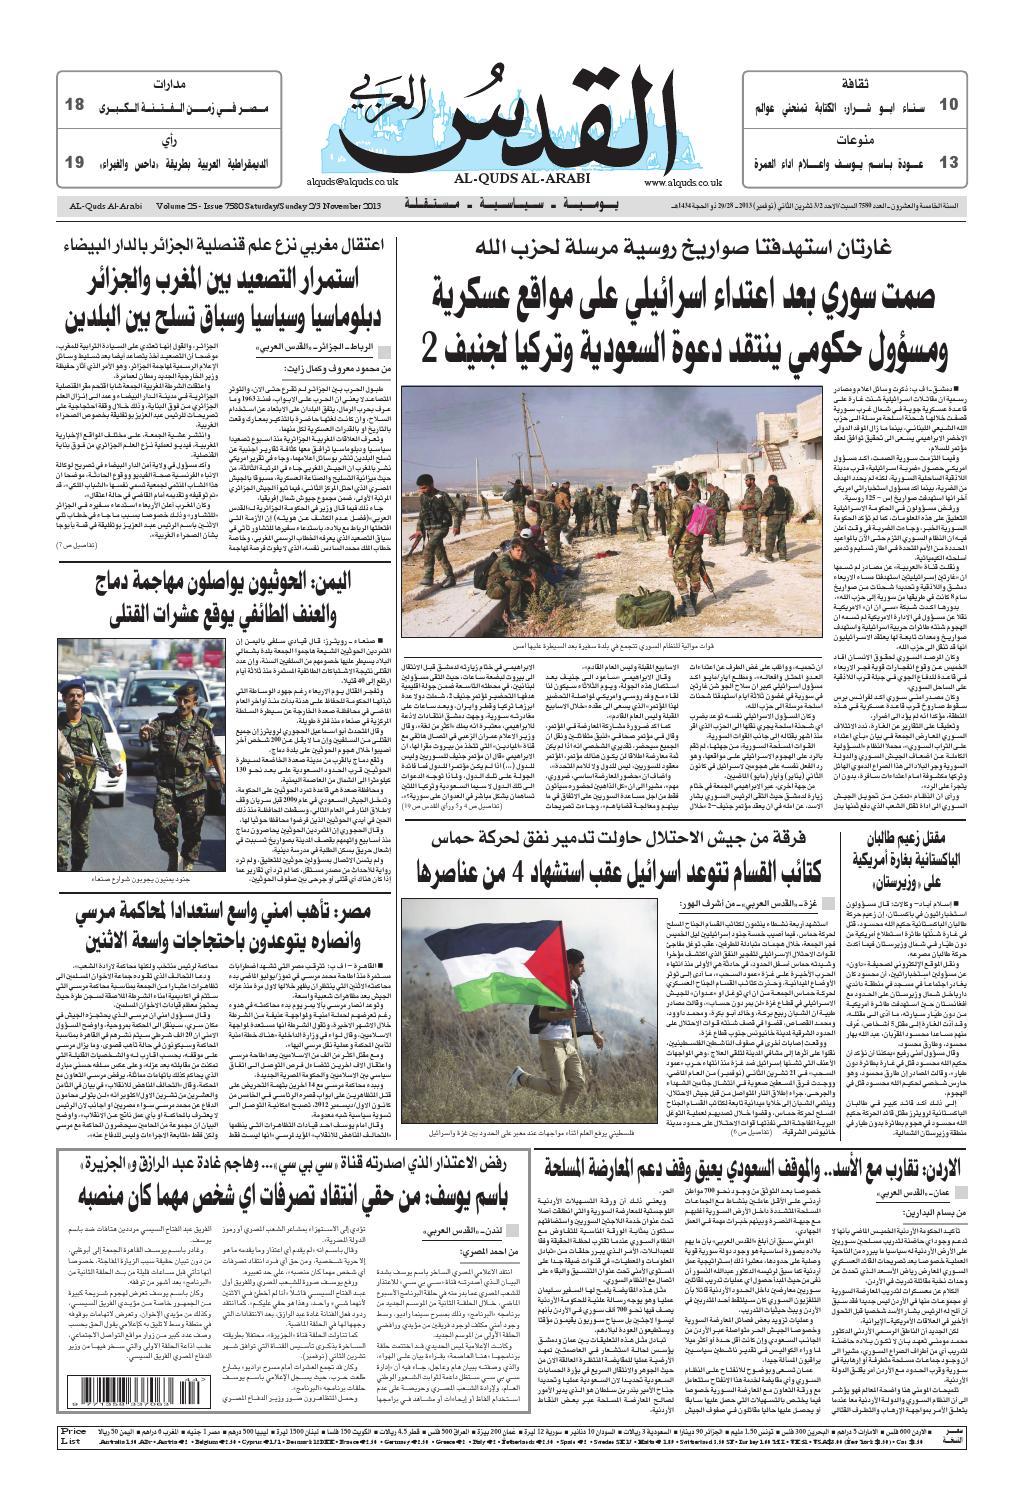 ff560143c صحيفة القدس العربي , السبت والأحد 02/03.11.2013 by مركز الحدث - issuu